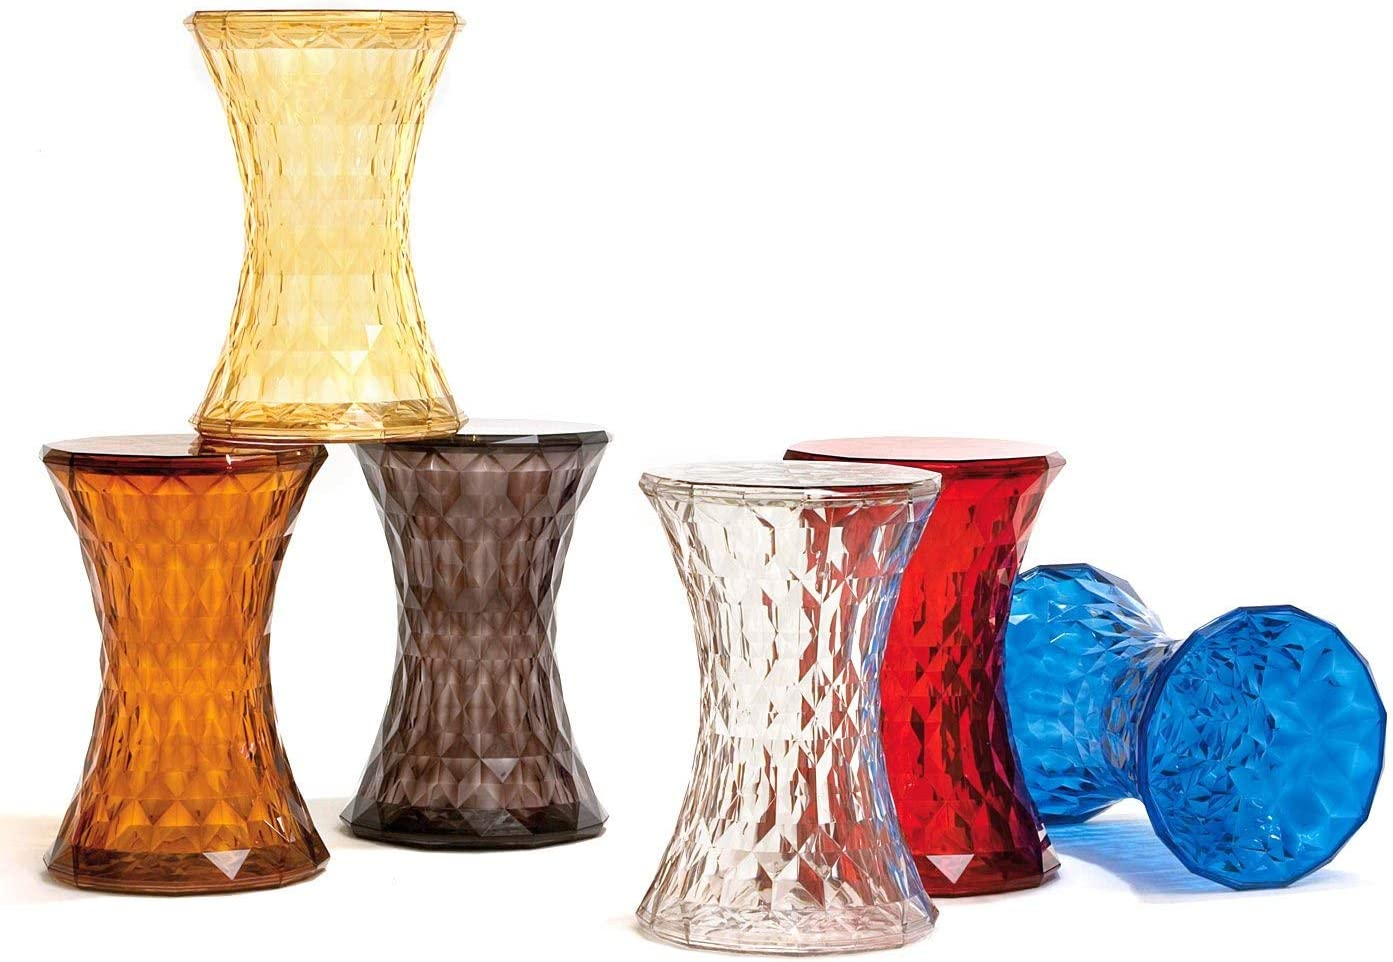 5 kg Color /ámbar D : Altura 30 x 45 cm Aproximadamente 2 Otomana Kartell 8800SA